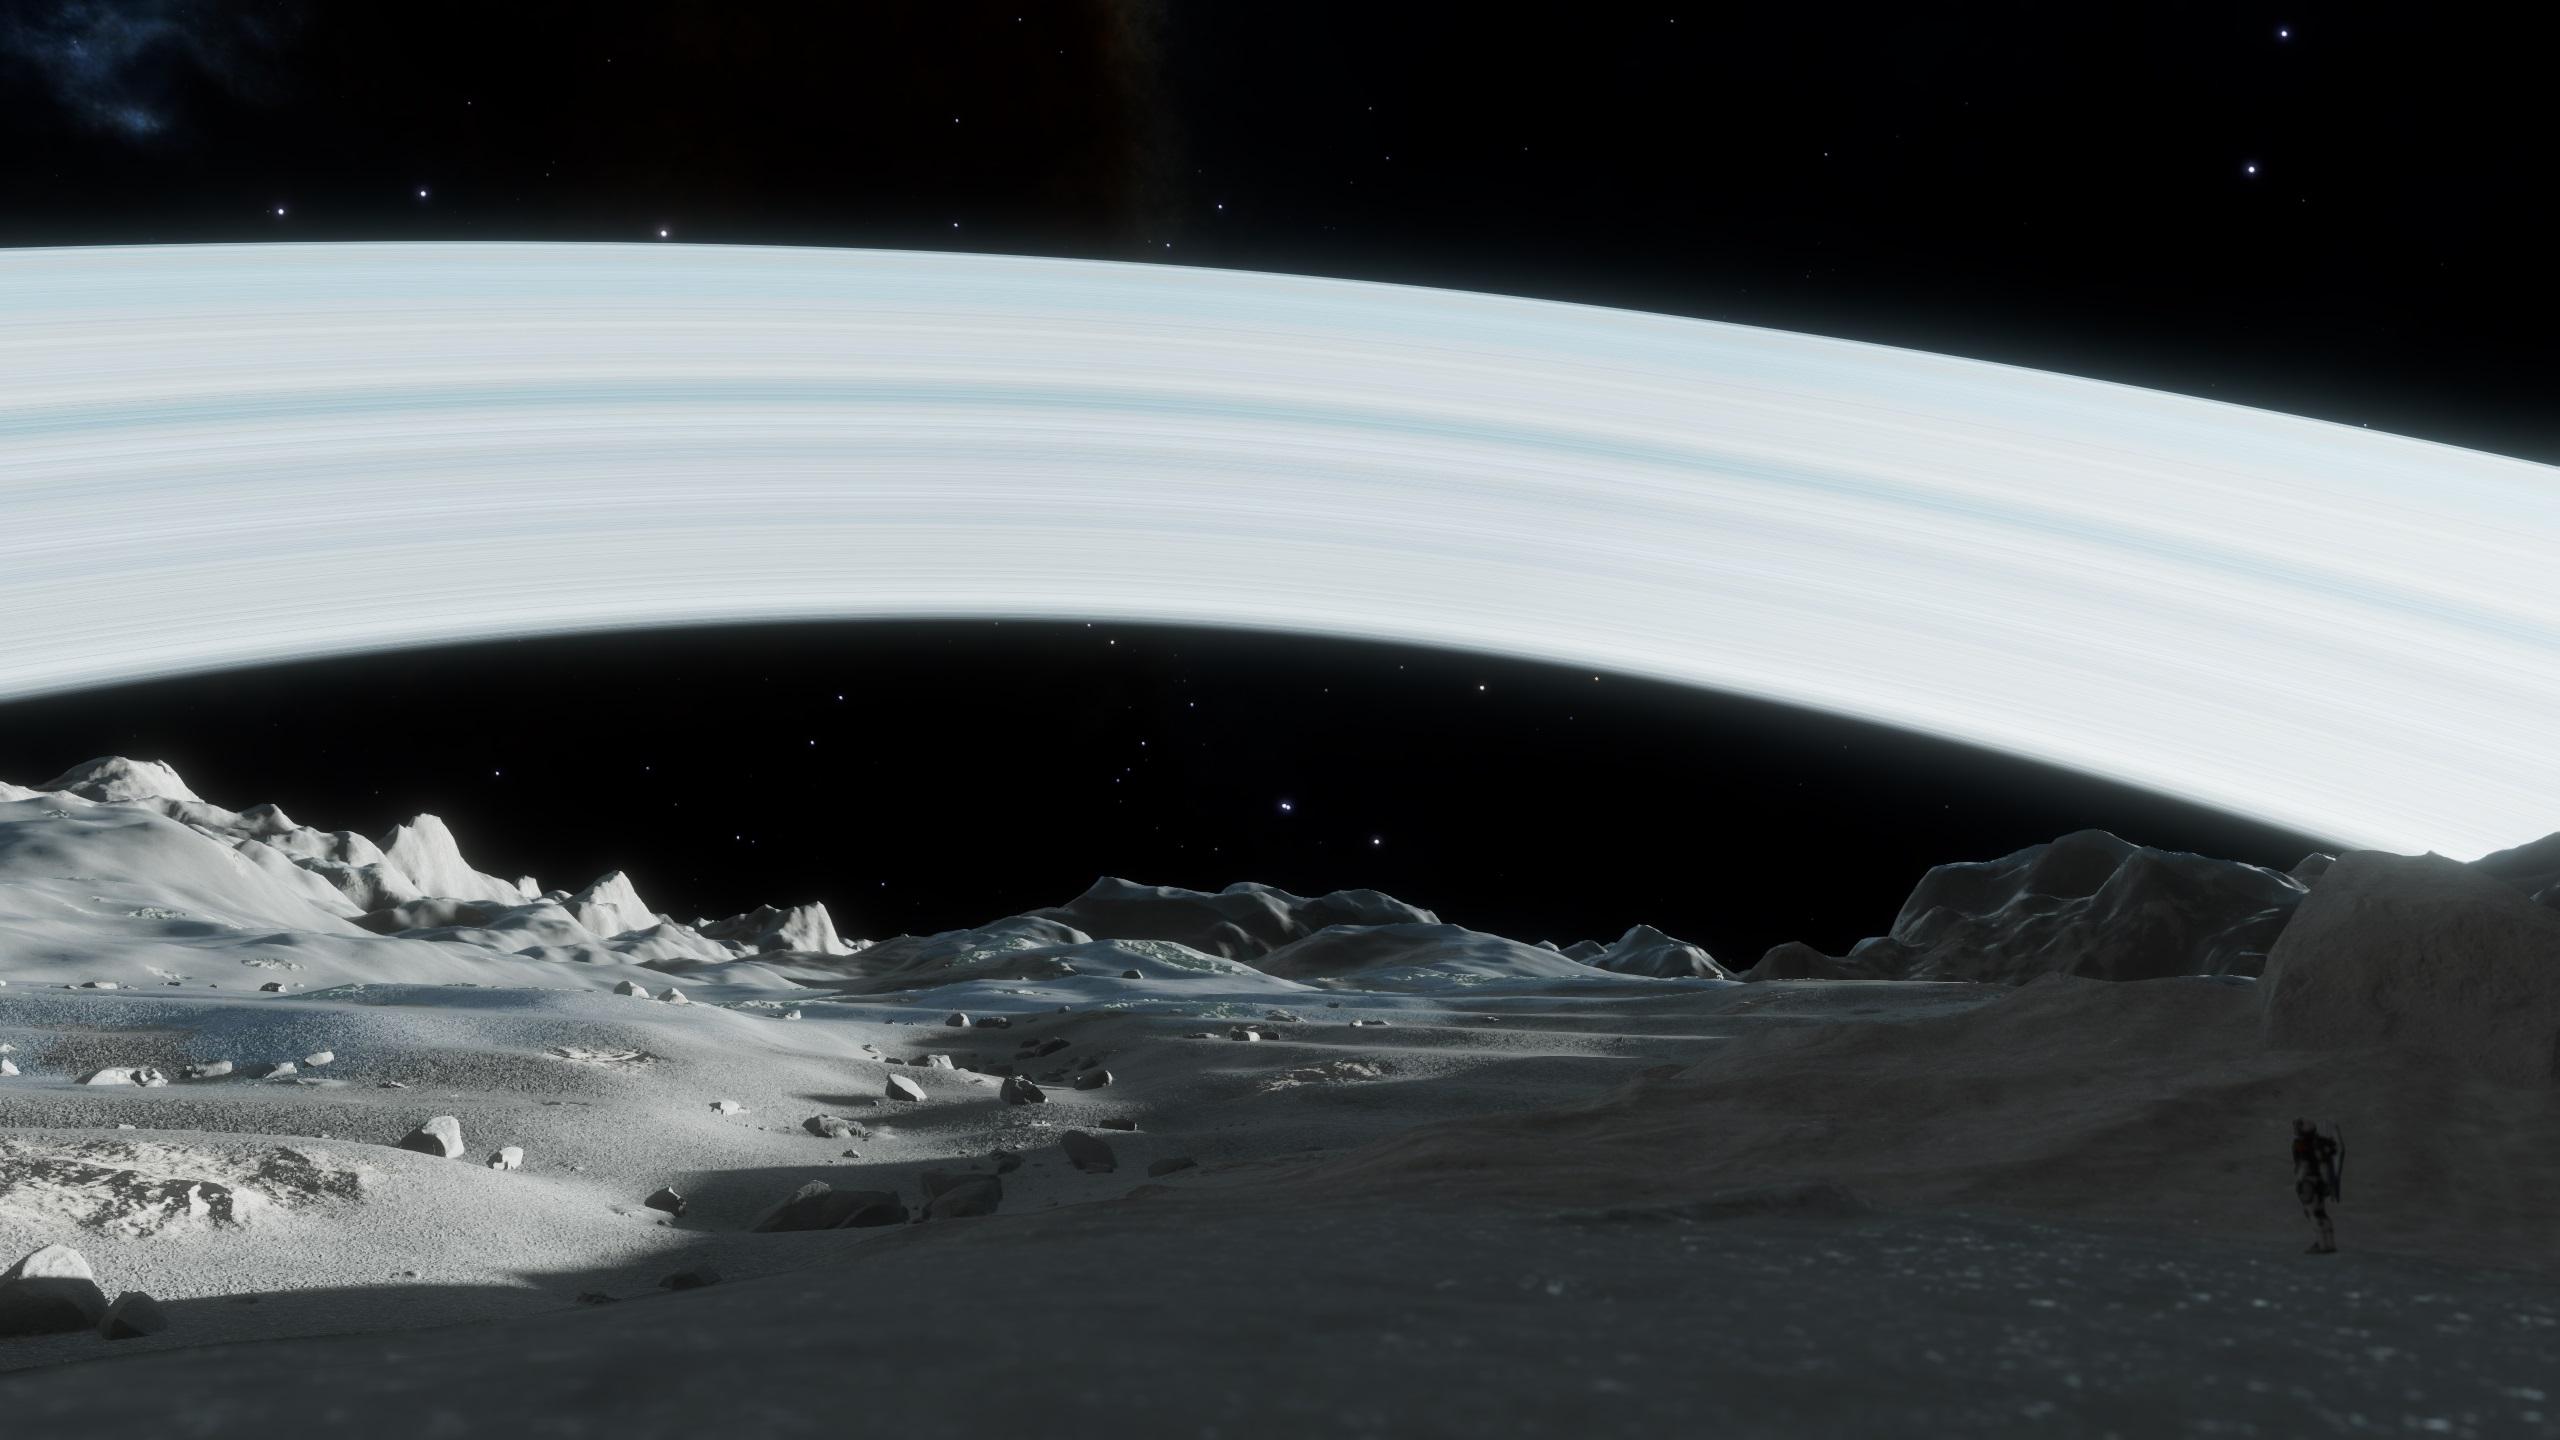 Elite Dangerous Screenshot 2021.10.07 - 21.37.49.41.jpg